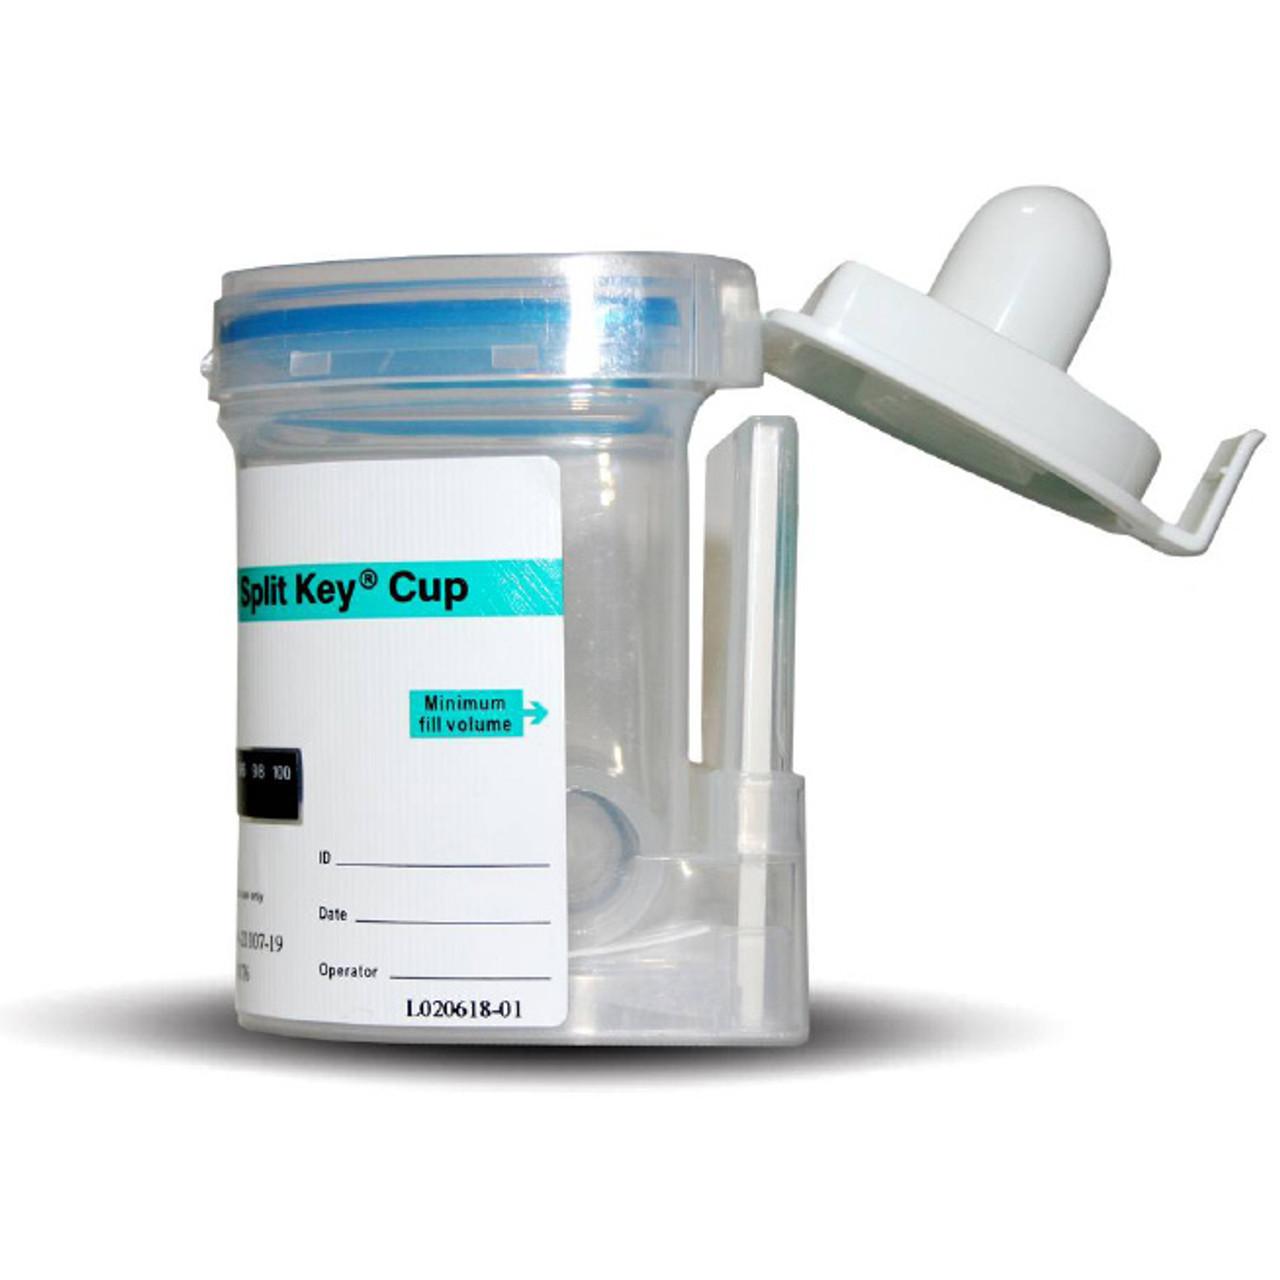 12 Panel E-Z Integrated Split Specimen Key Cup Drug Test 25/Box